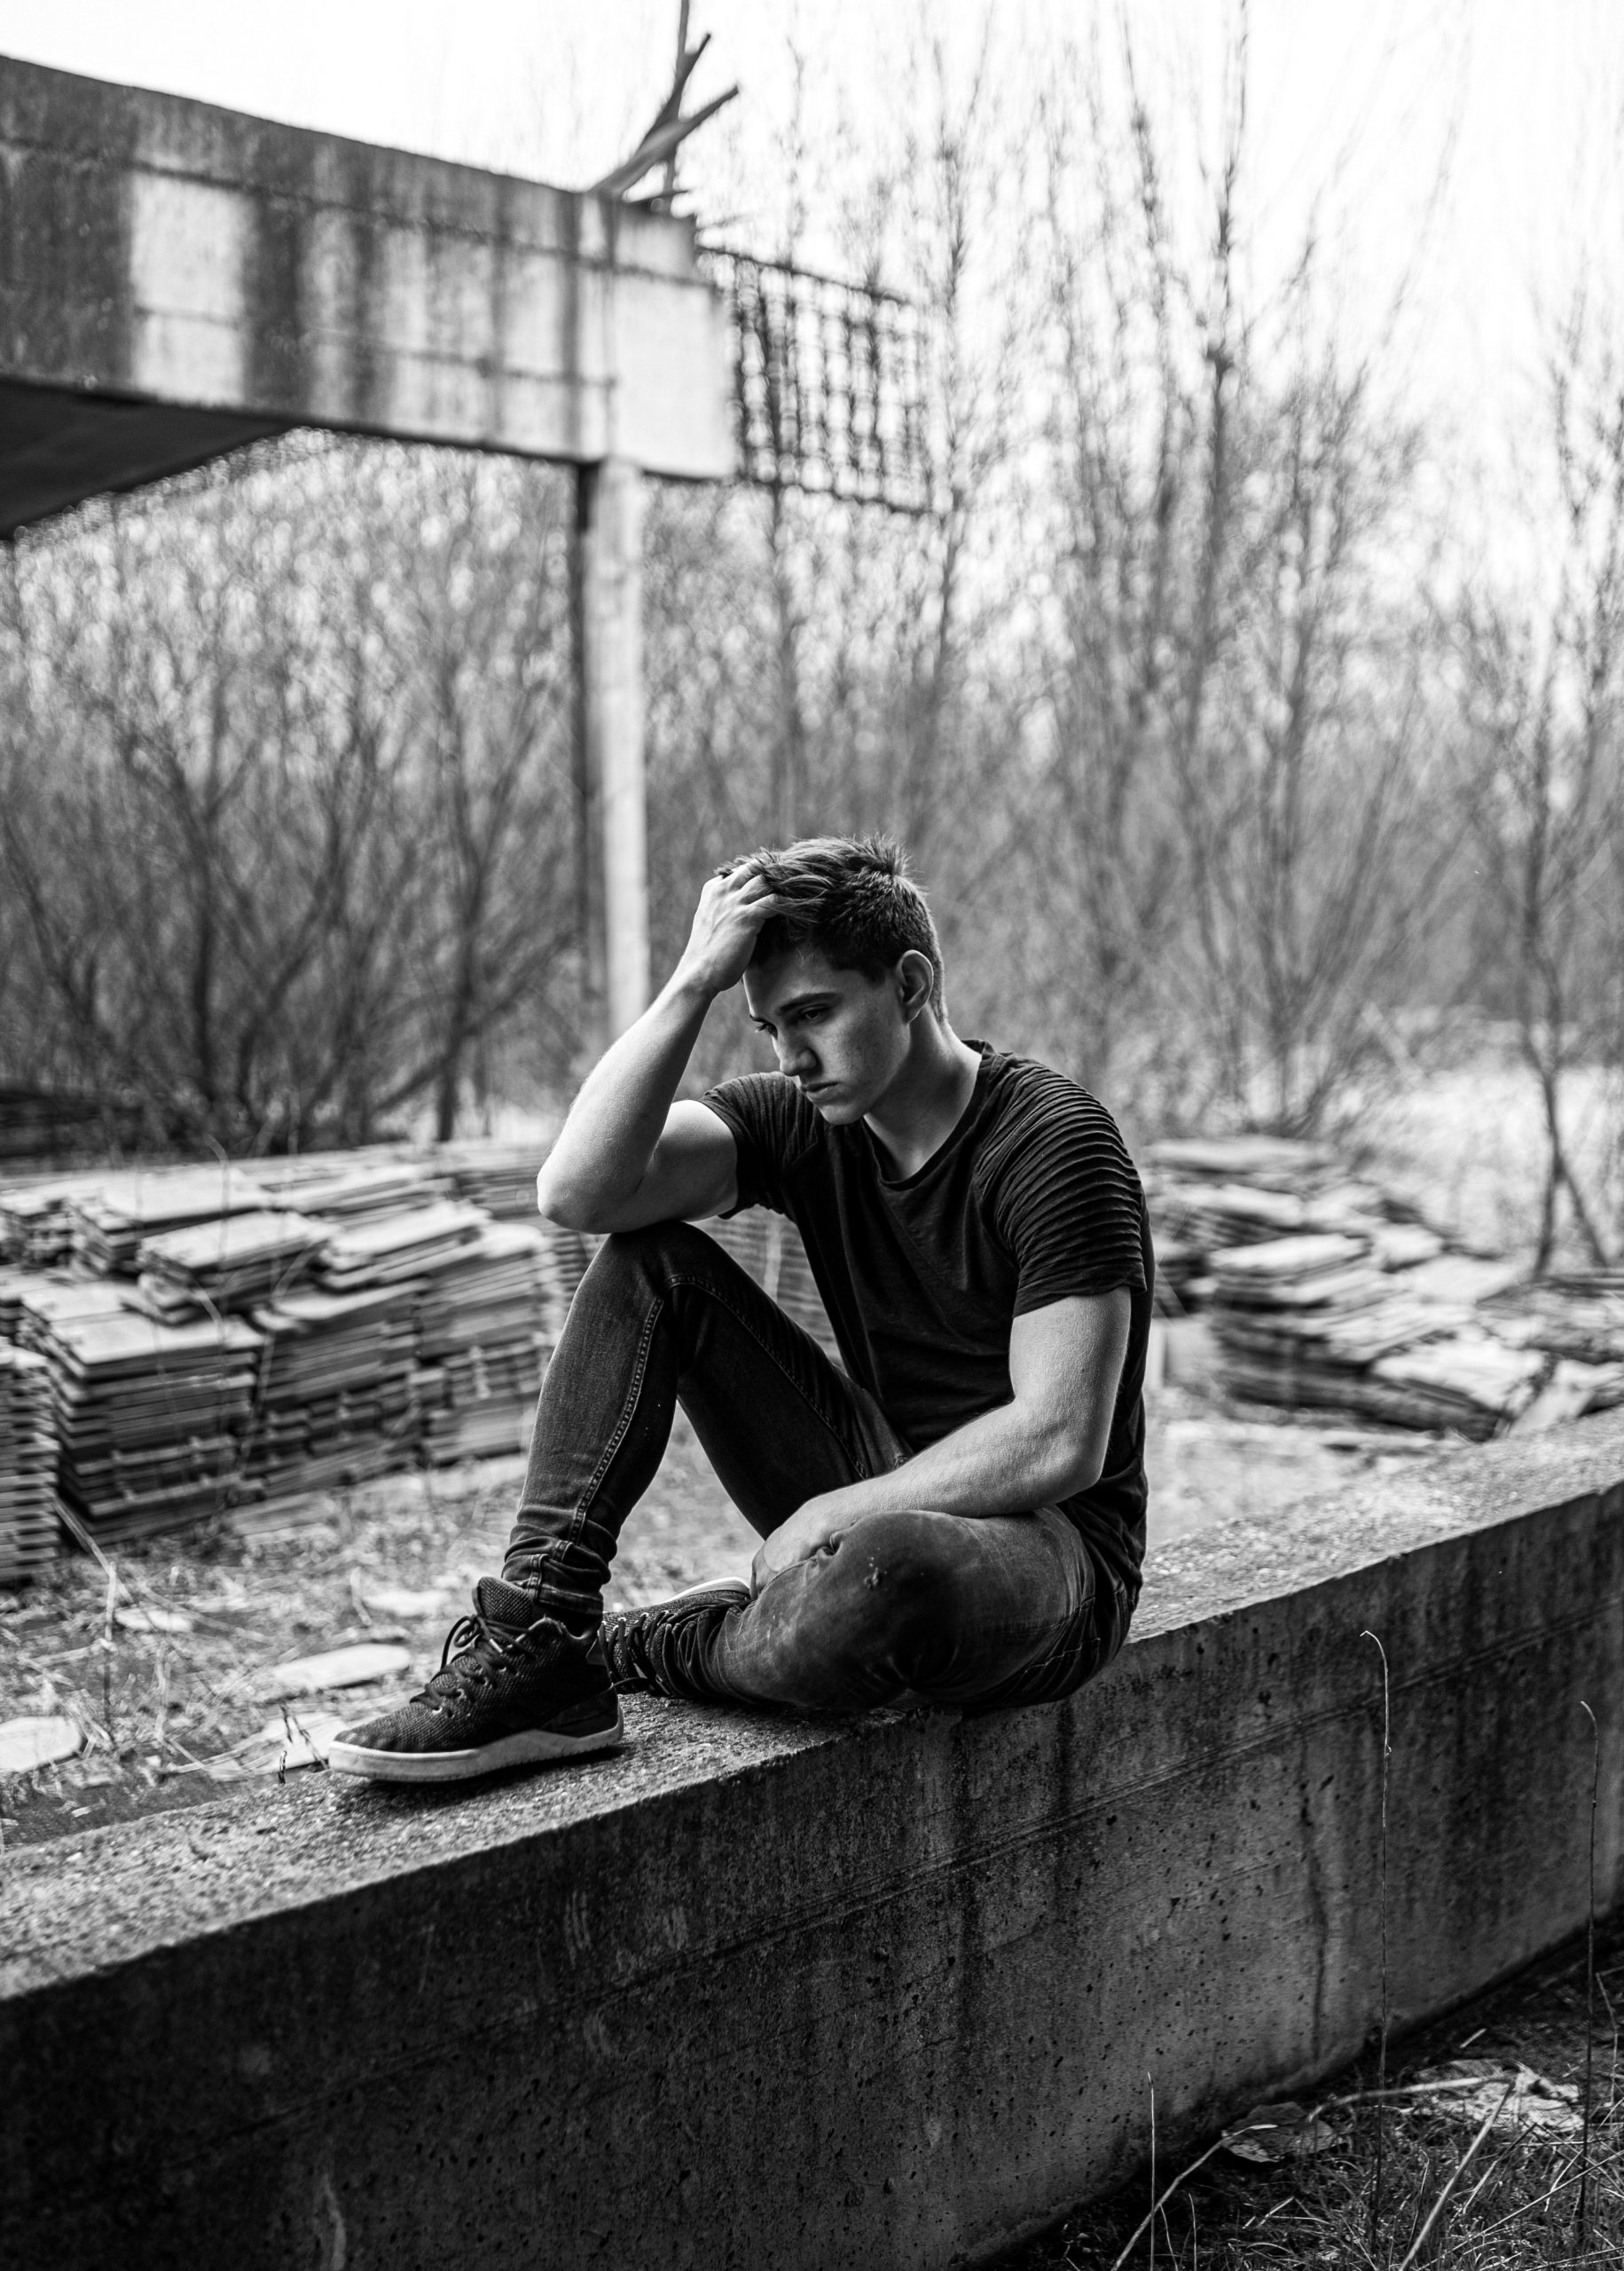 hd 2021 Latest Sad Boy Dp Images